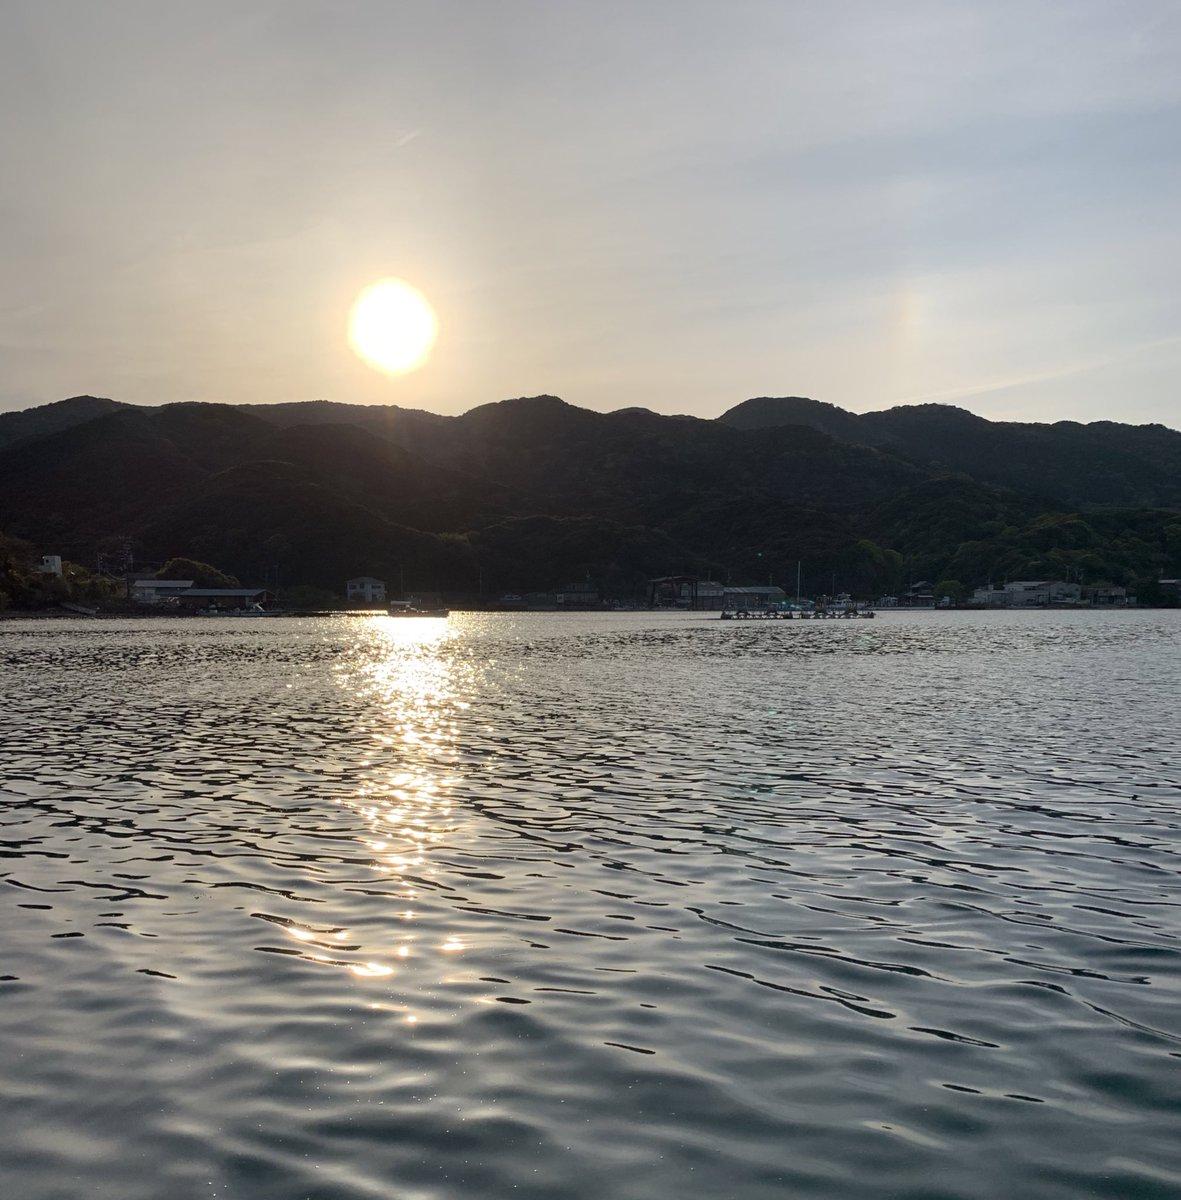 test ツイッターメディア - 淡路島で釣り開始します🎣 https://t.co/MUhEeClPcS